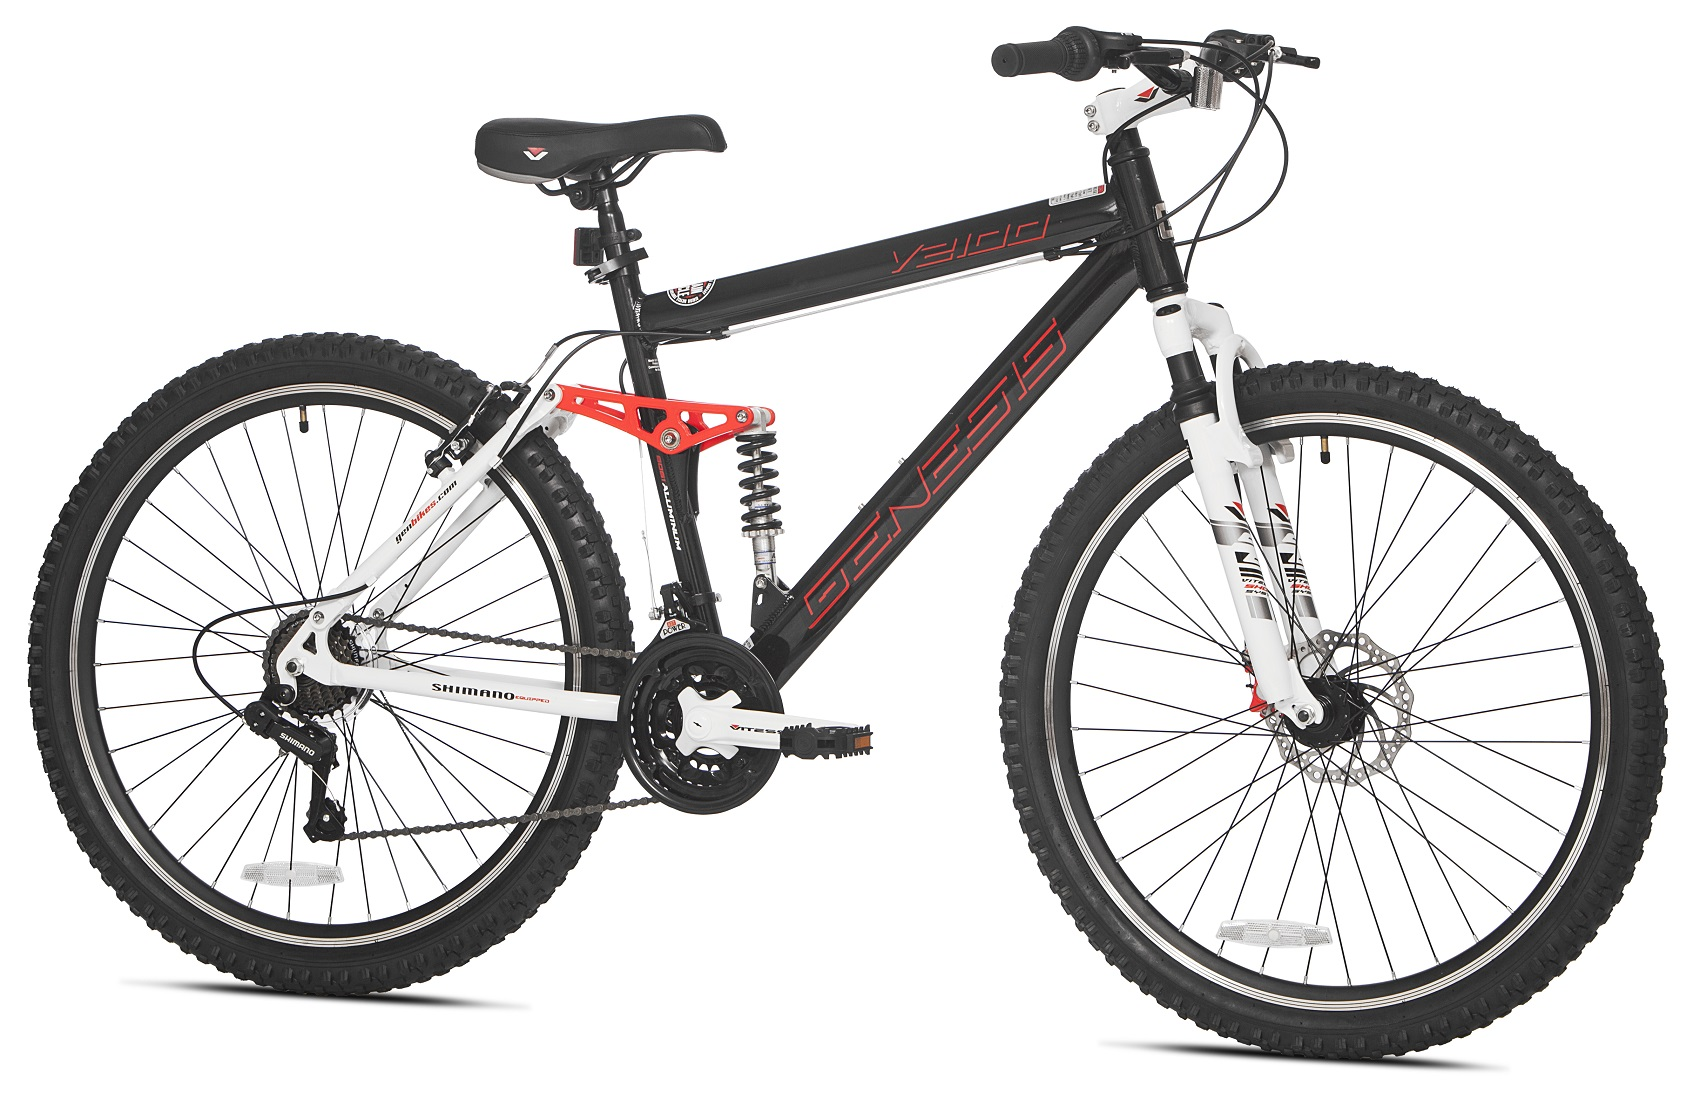 27 5 mens mountain bike black genesis bicycle 21 speed. Black Bedroom Furniture Sets. Home Design Ideas